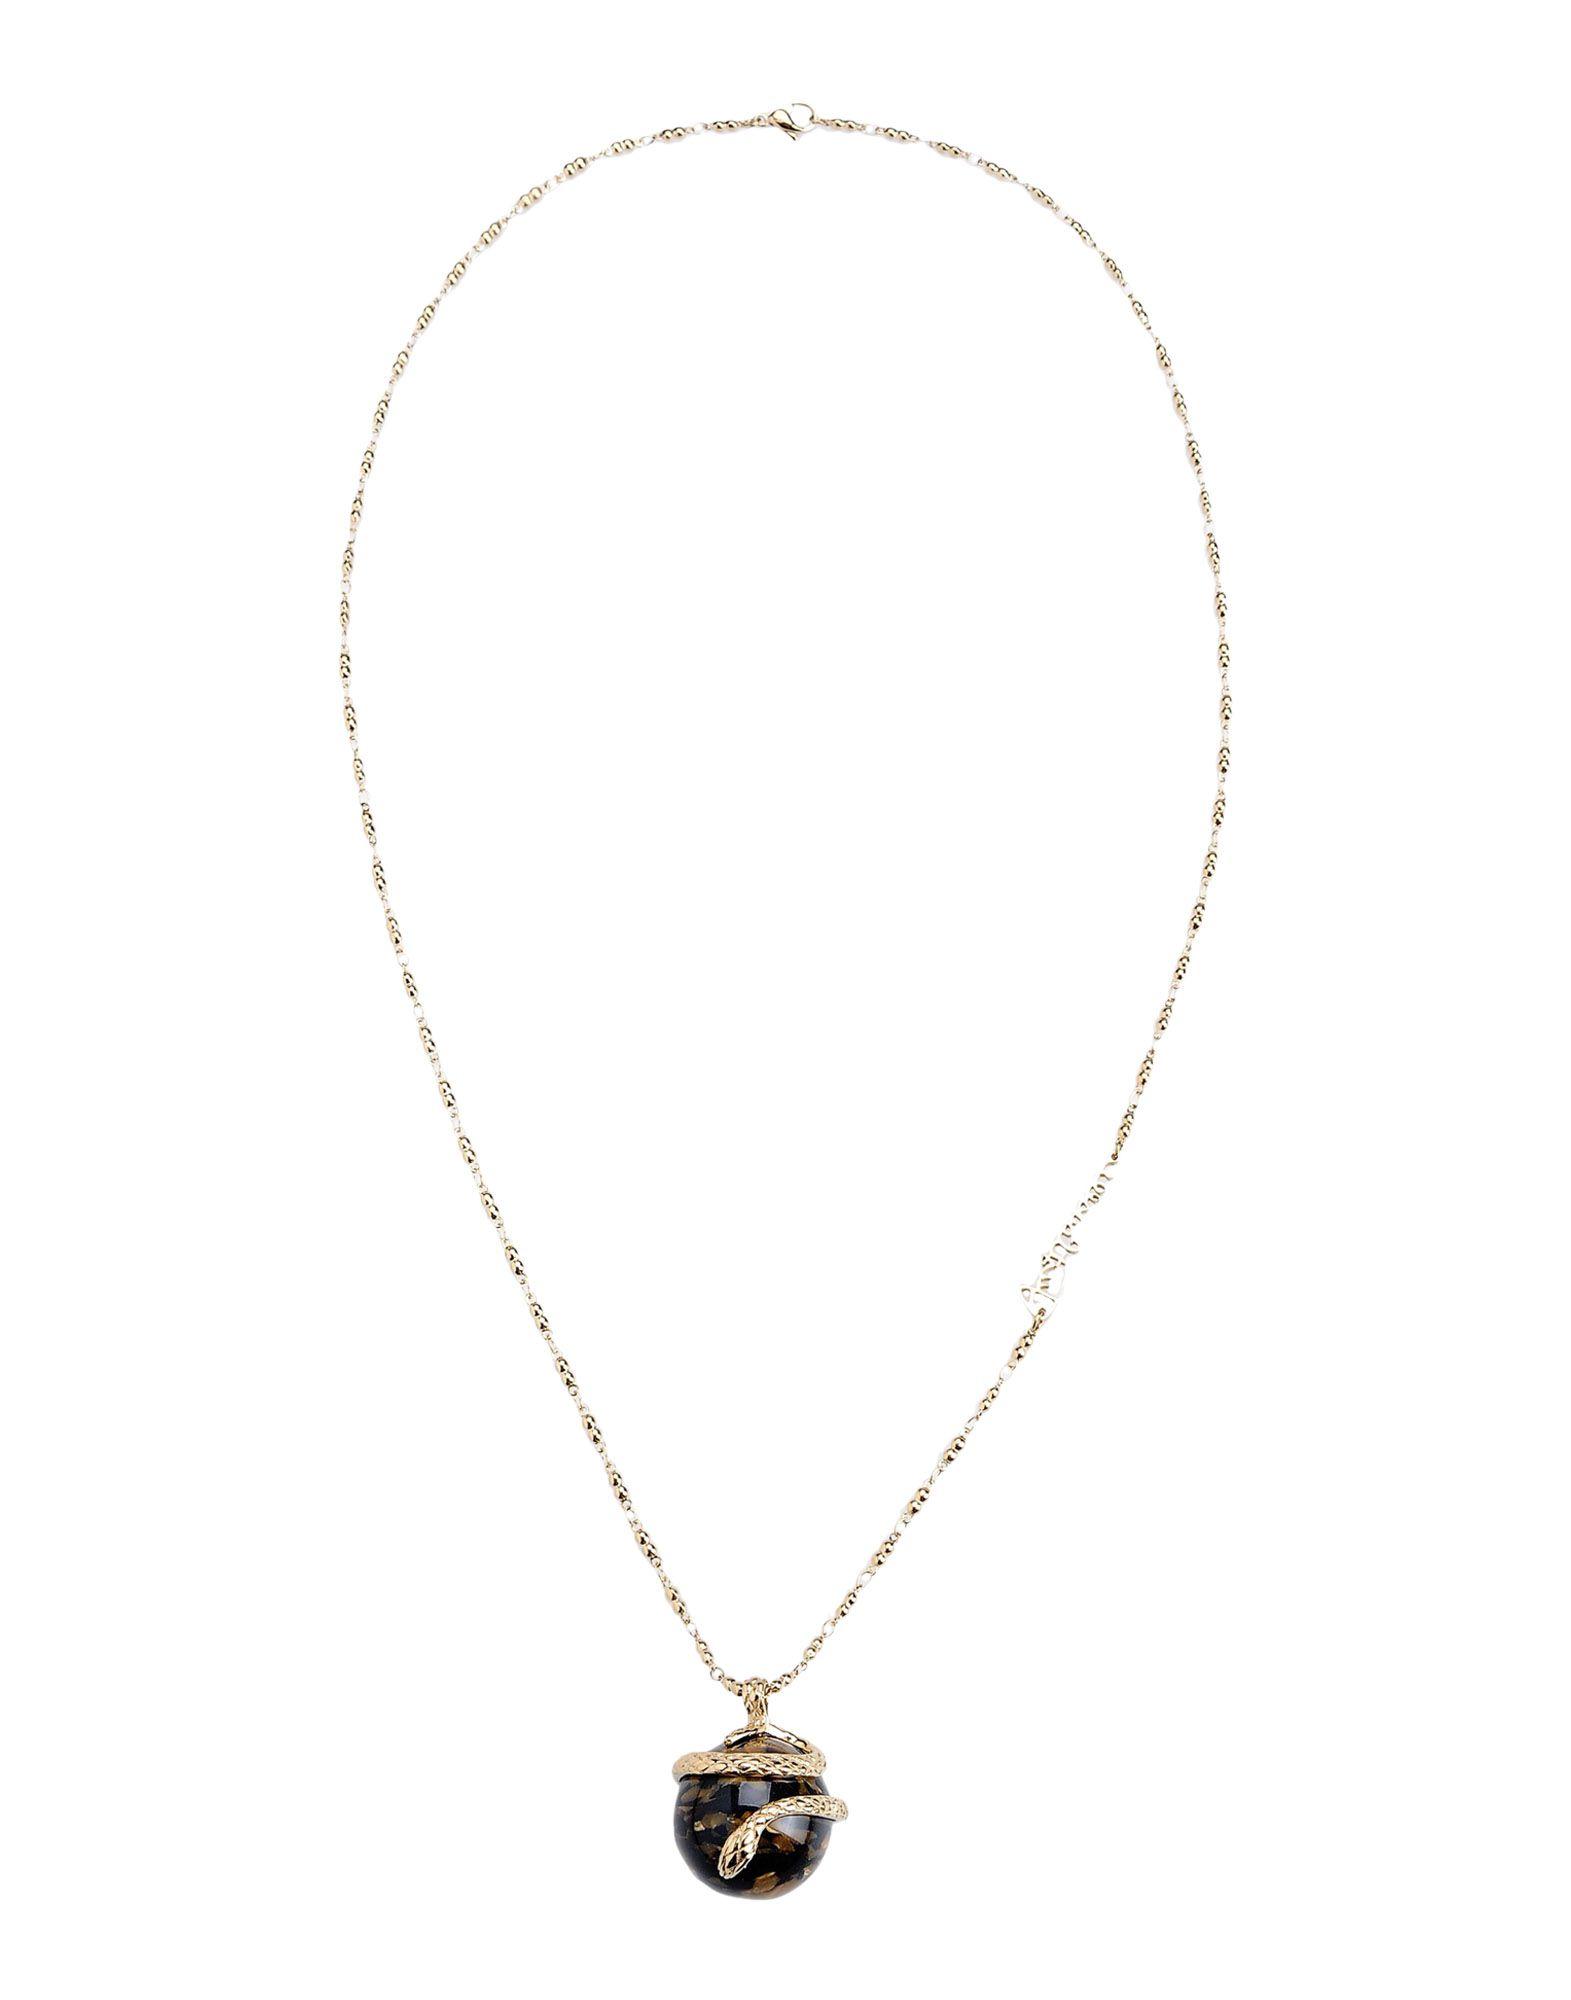 Titti Peggy JEWELRY - Necklaces su YOOX.COM qY3ESSfjNH